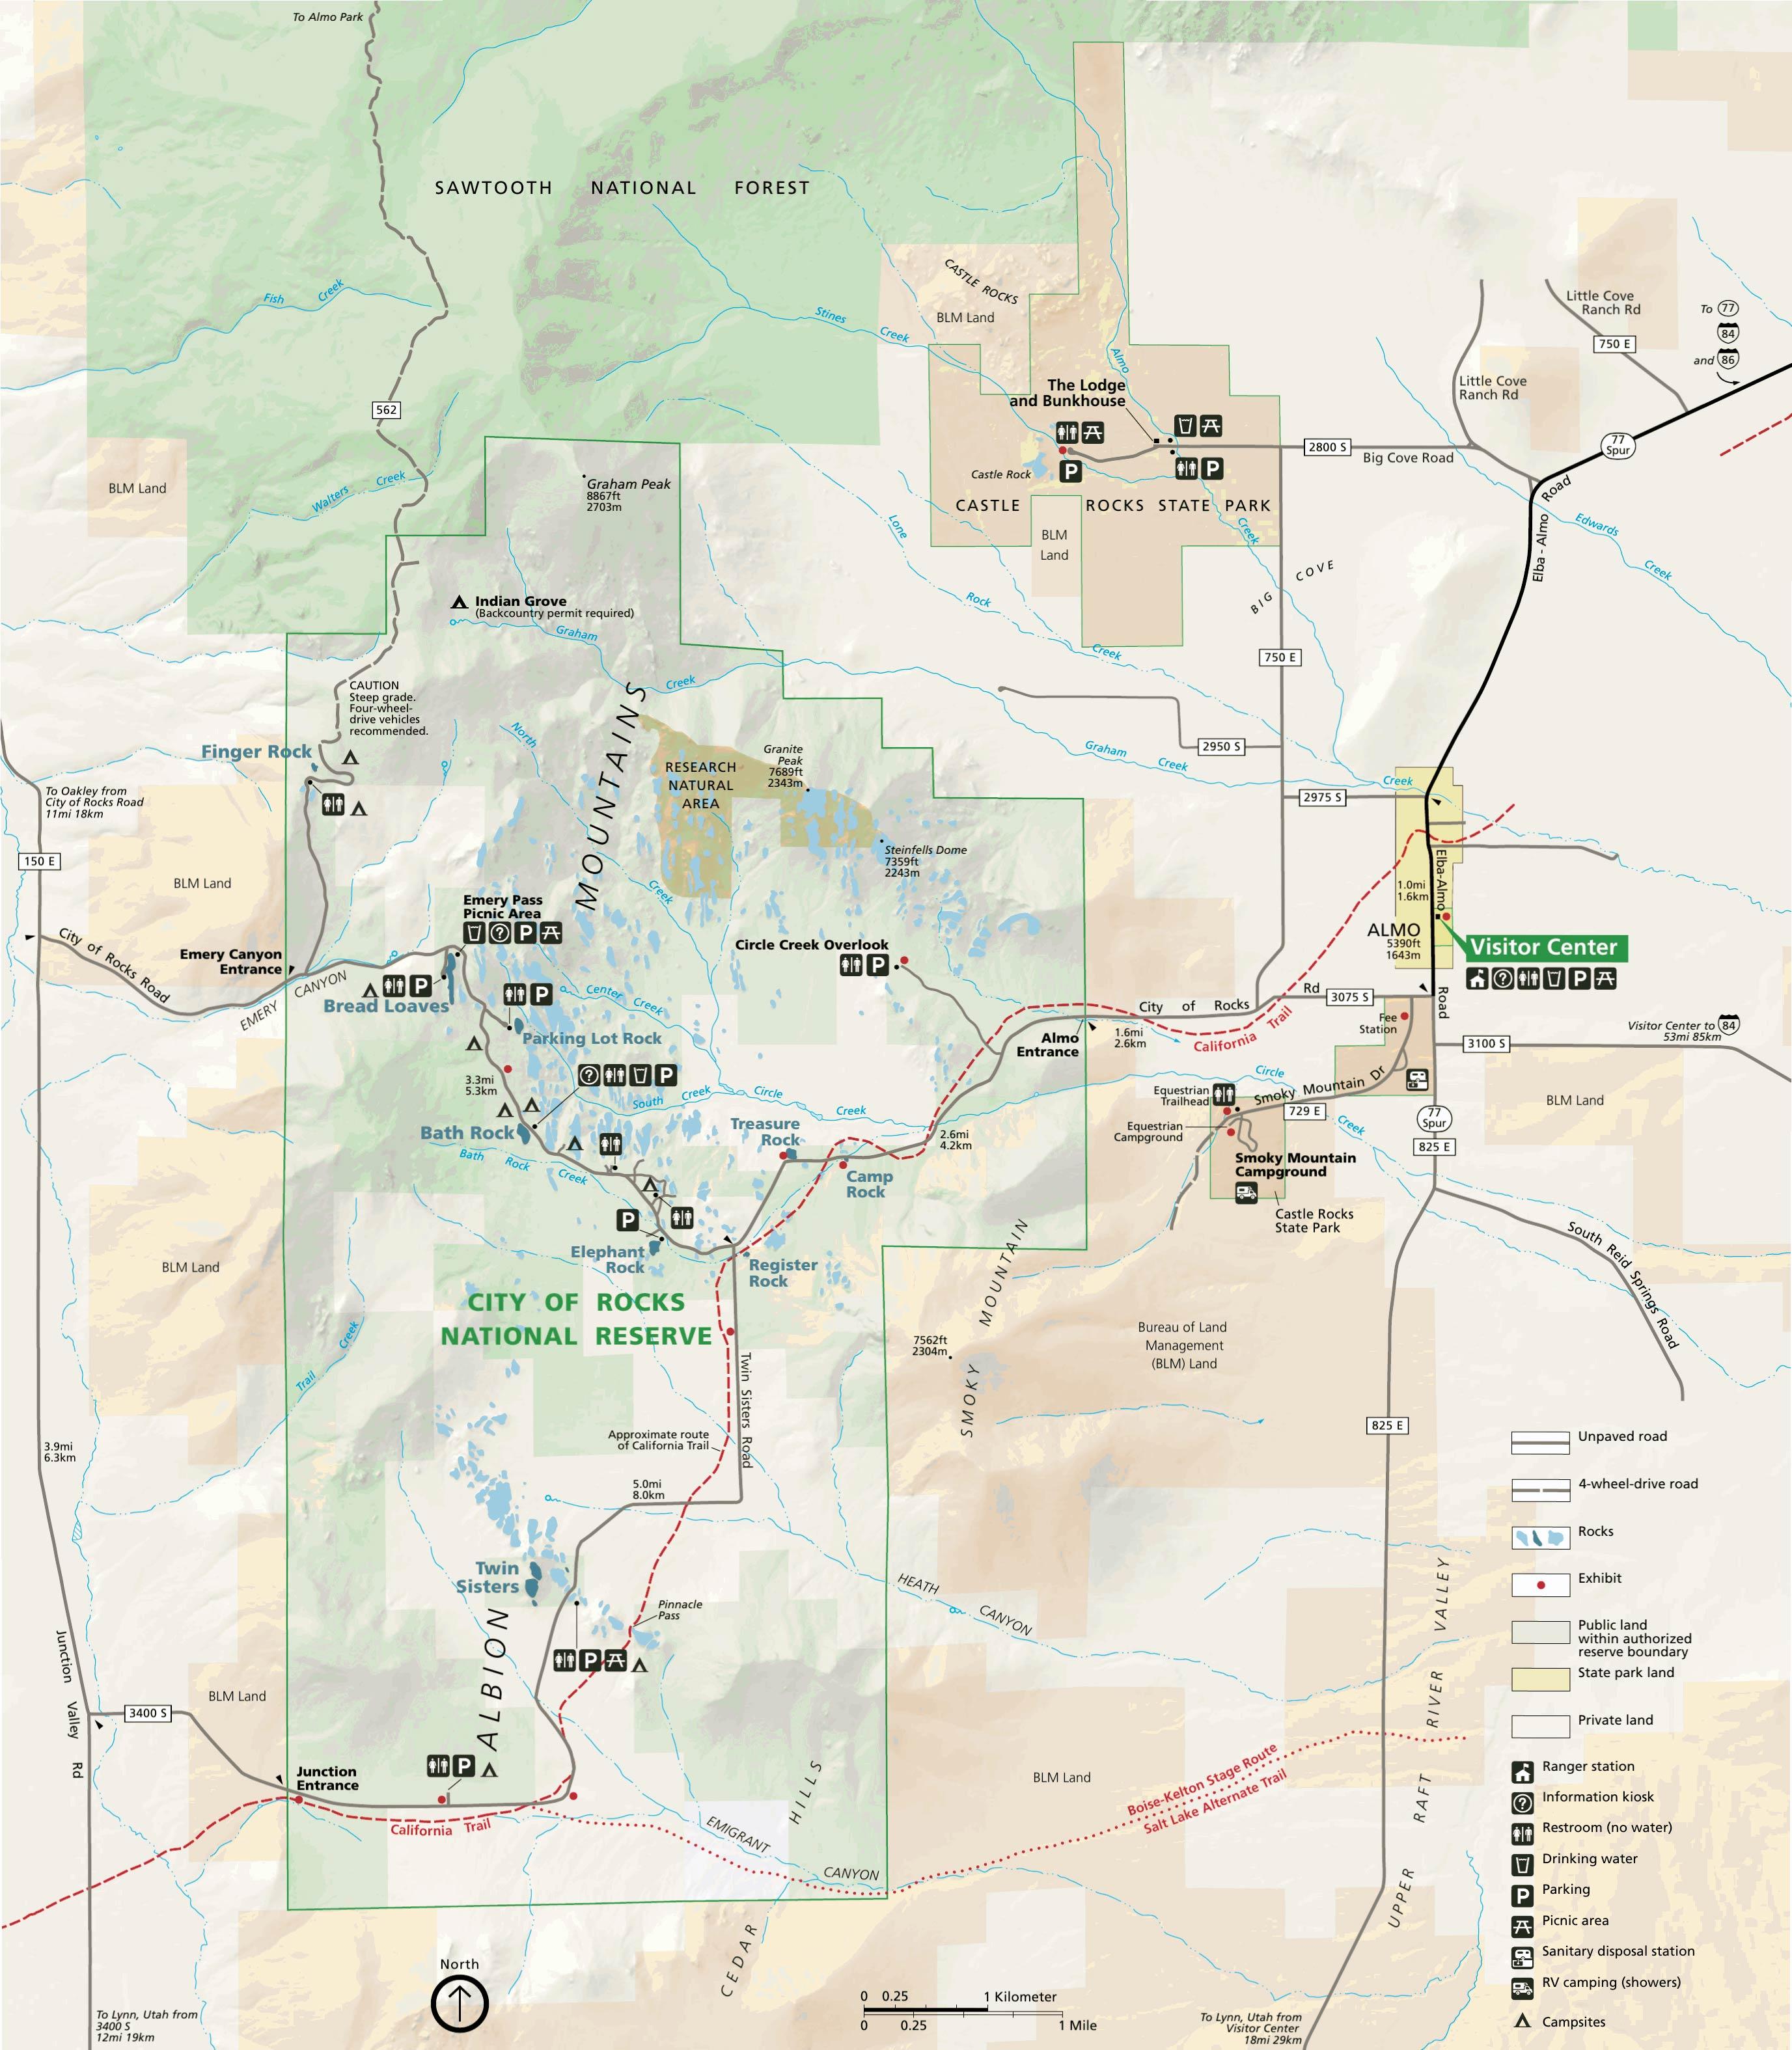 City of Rocks City Of Sunrise Map on tiber city map, colorful city map, dunedin city map, temecula city map, lecanto city map, port st lucie city map, marco island city map, destin city map, glendale city map, fernandina beach city map, kendall city map, ocoee city map, suwannee county city map, kissimmee city map, raleigh city map, miramar city map, belle isle city map, dunnellon city map, alpharetta city map, seminole city map,